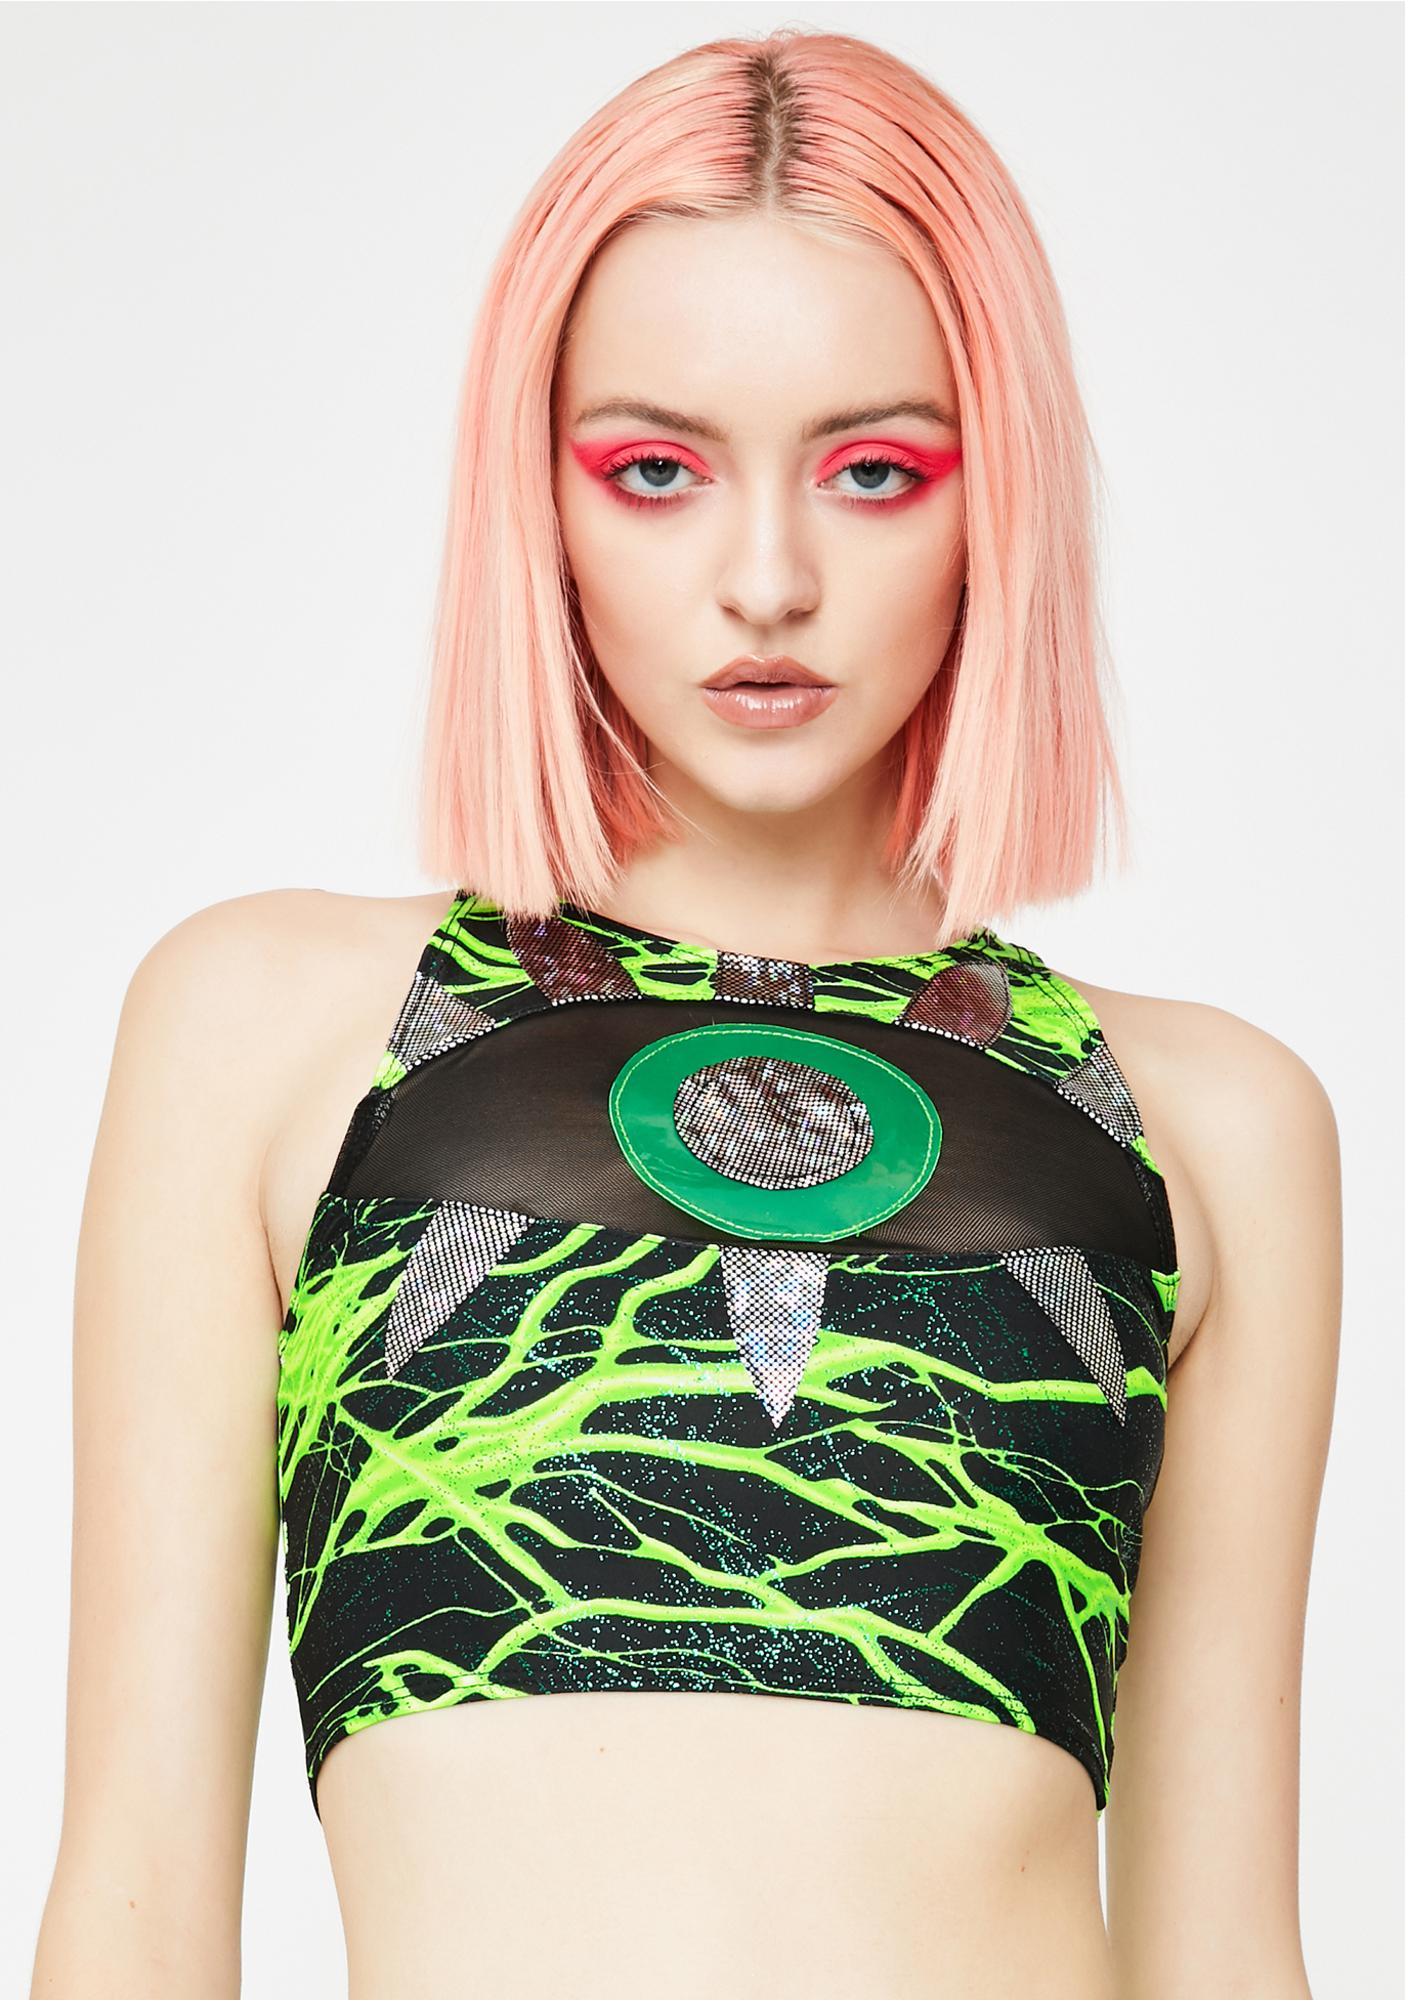 J Valentine Neon Lightning Eyeball Crop Top